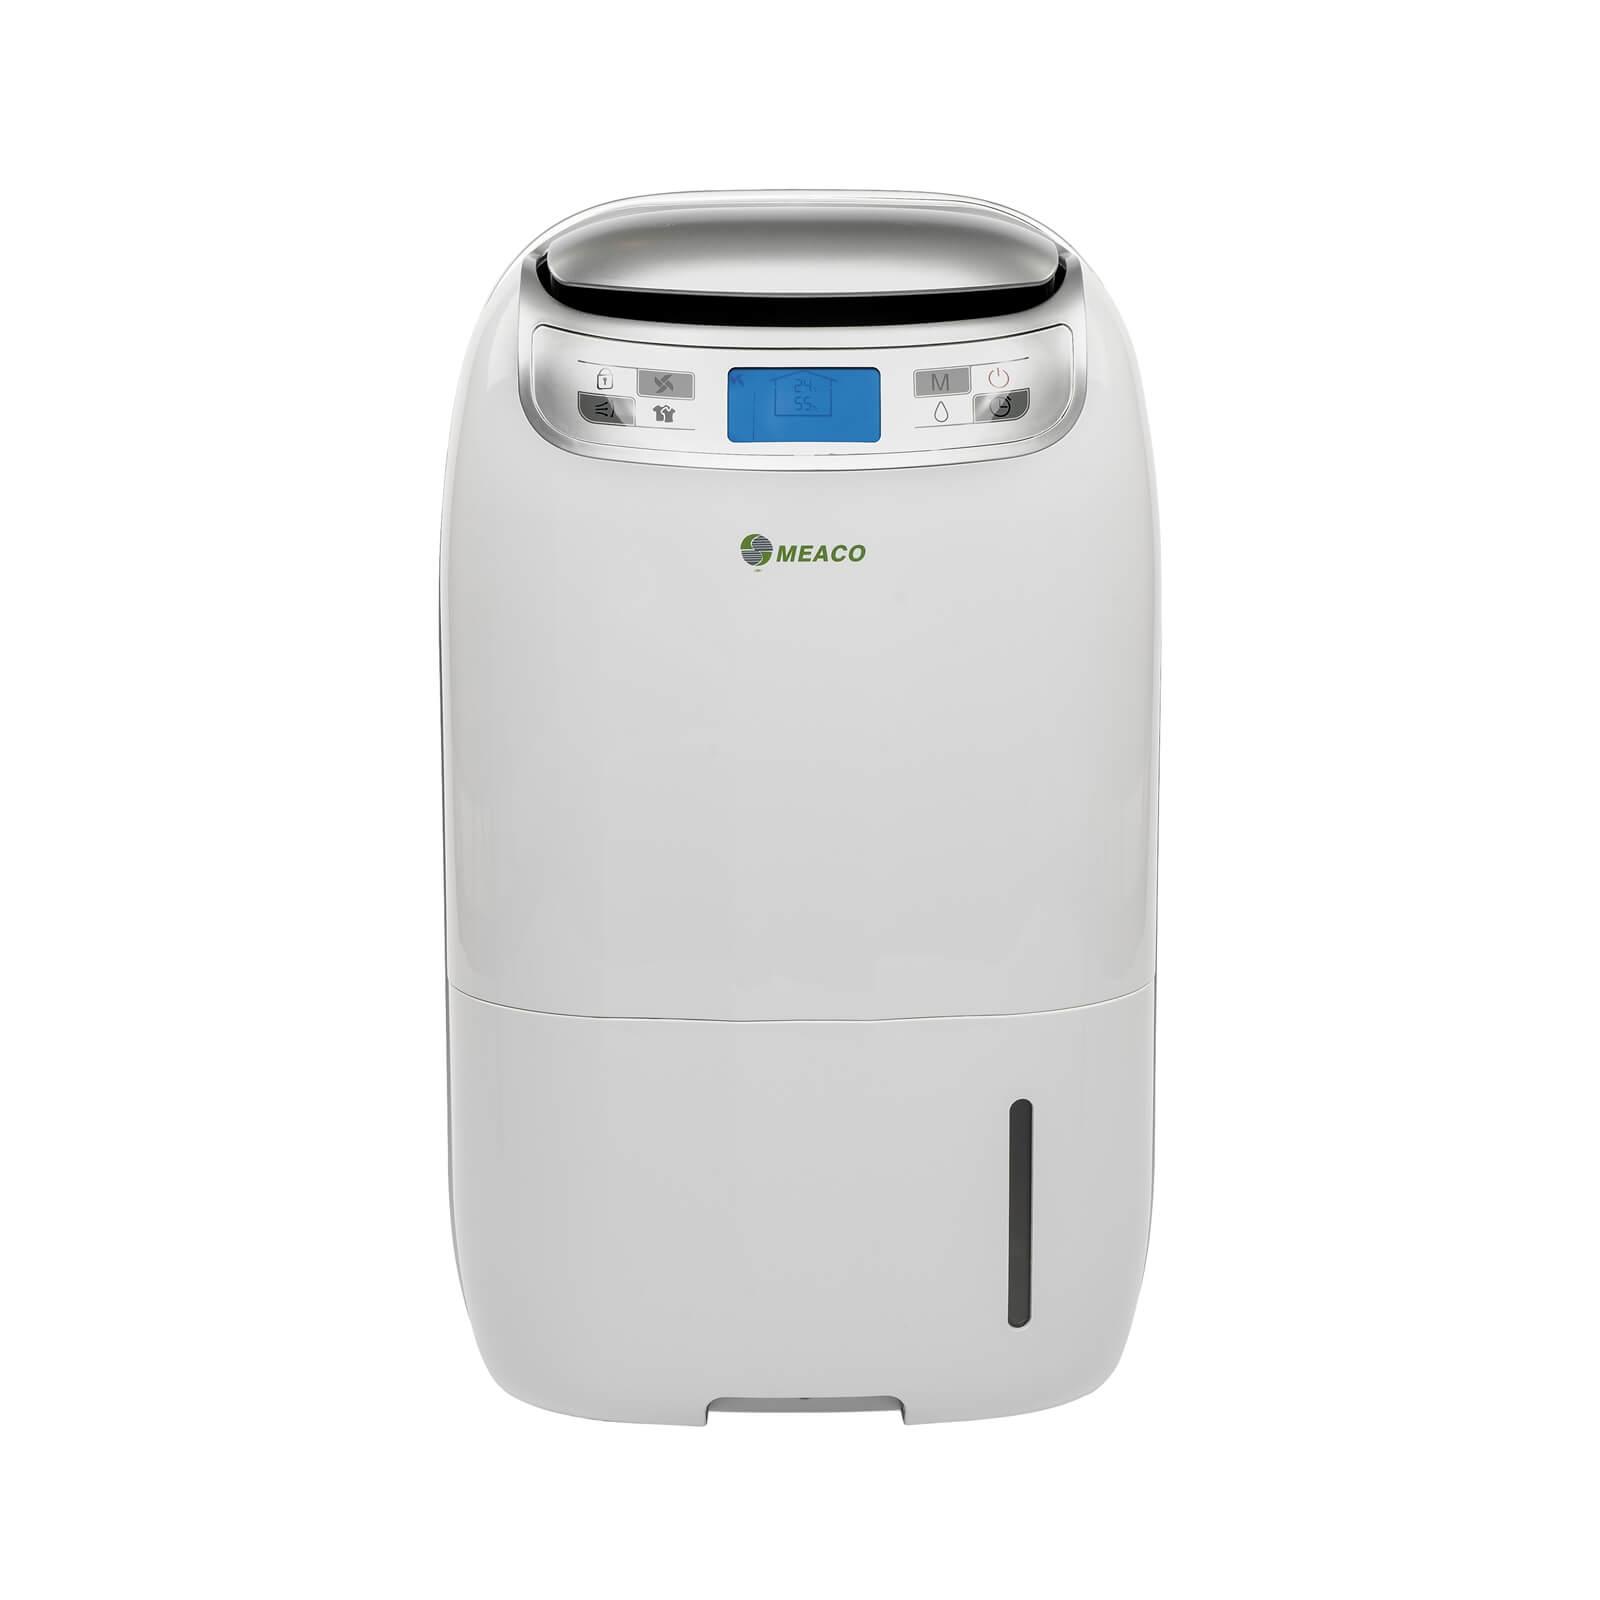 Meaco 25L Ultra Low Energy Dehumidifier